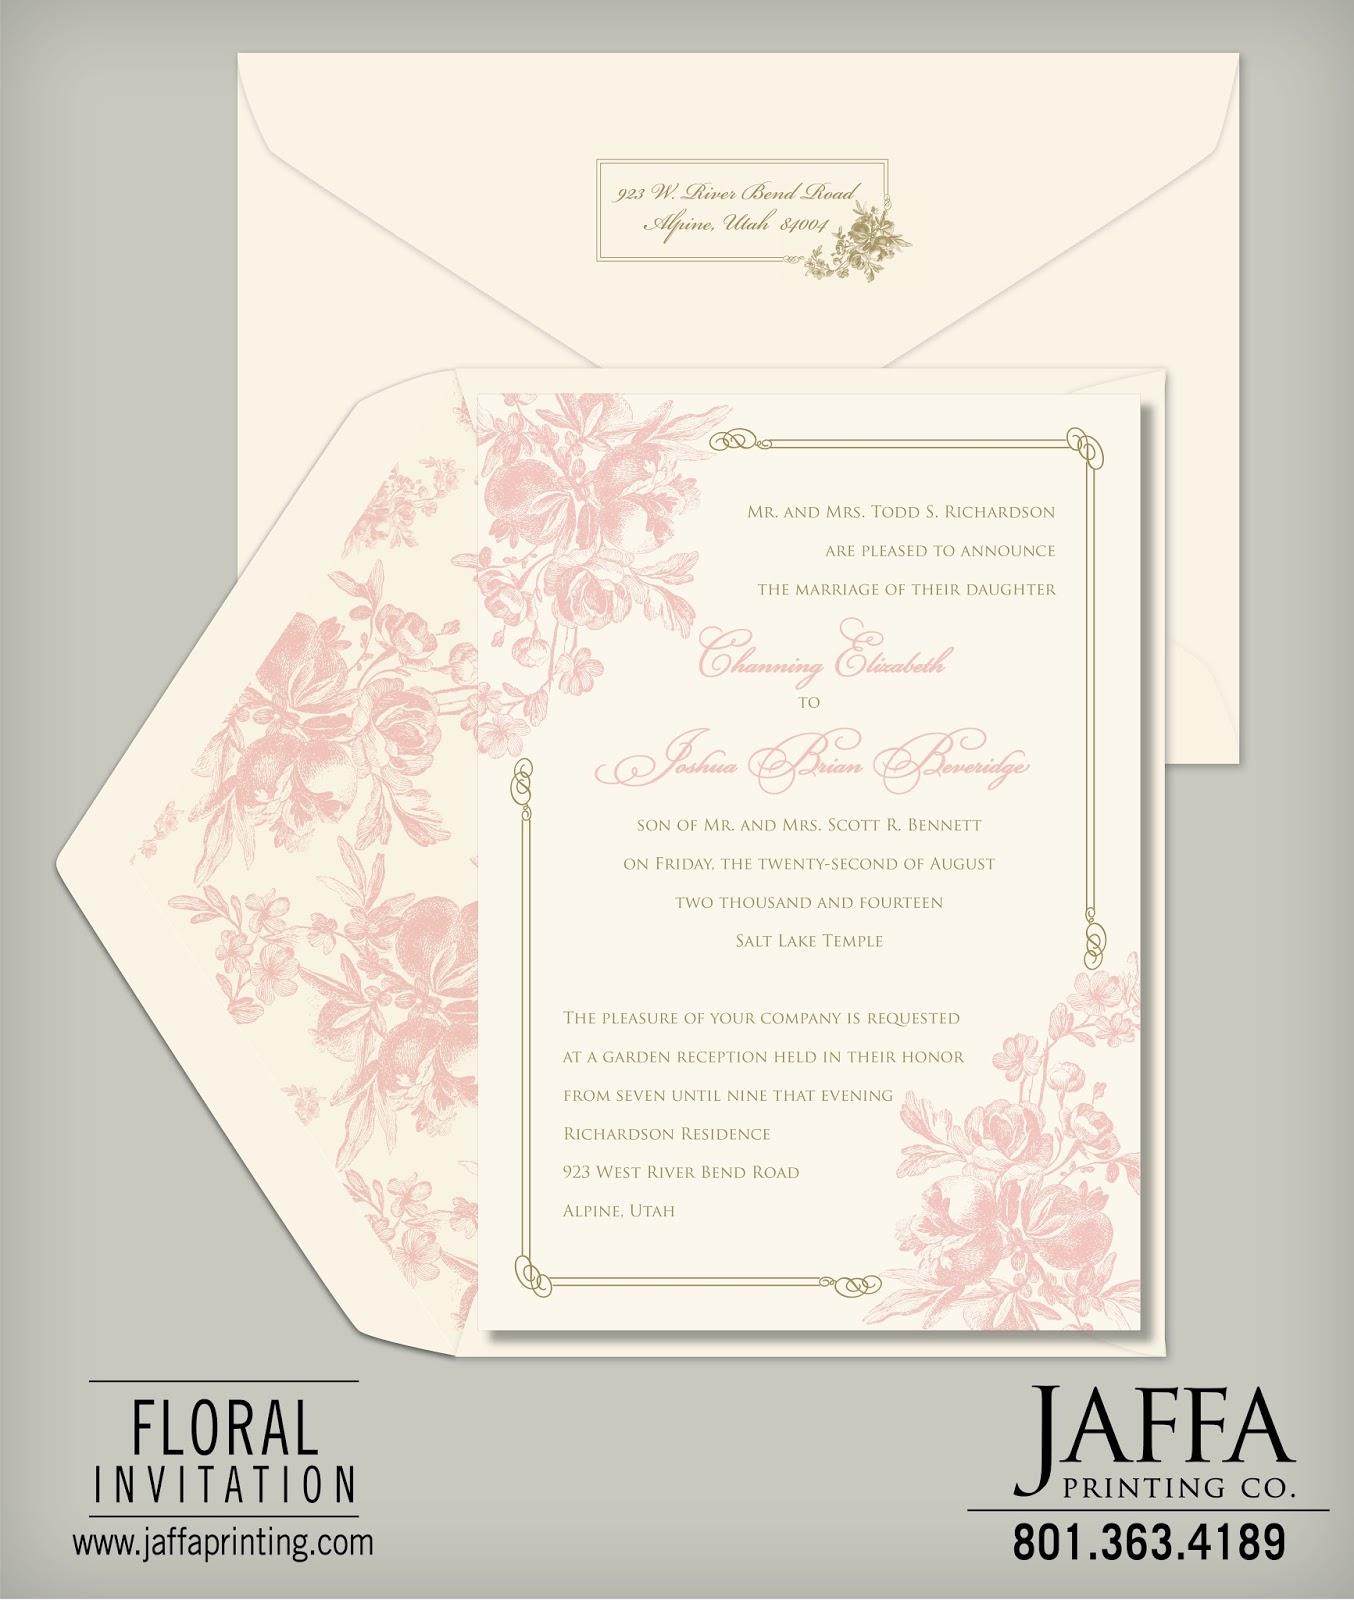 Wedding Invitation Blog: Your Wedding Invitation, Your Way